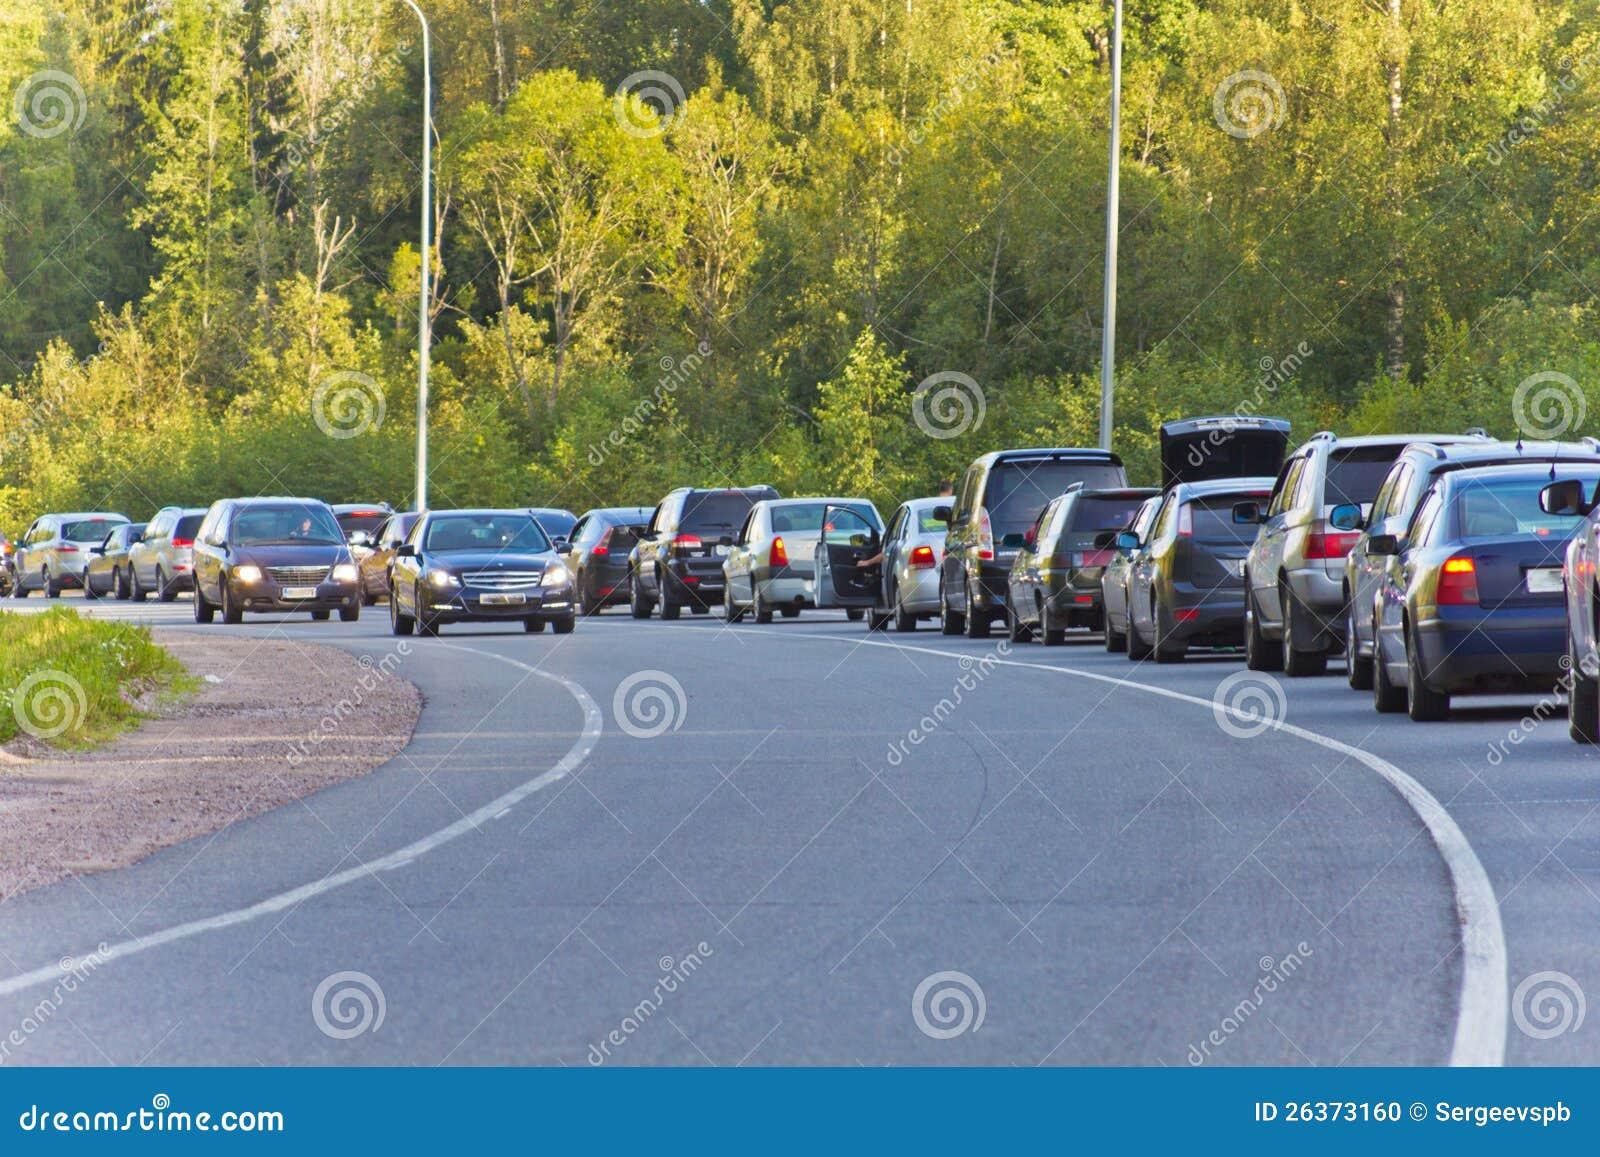 Cars in turn